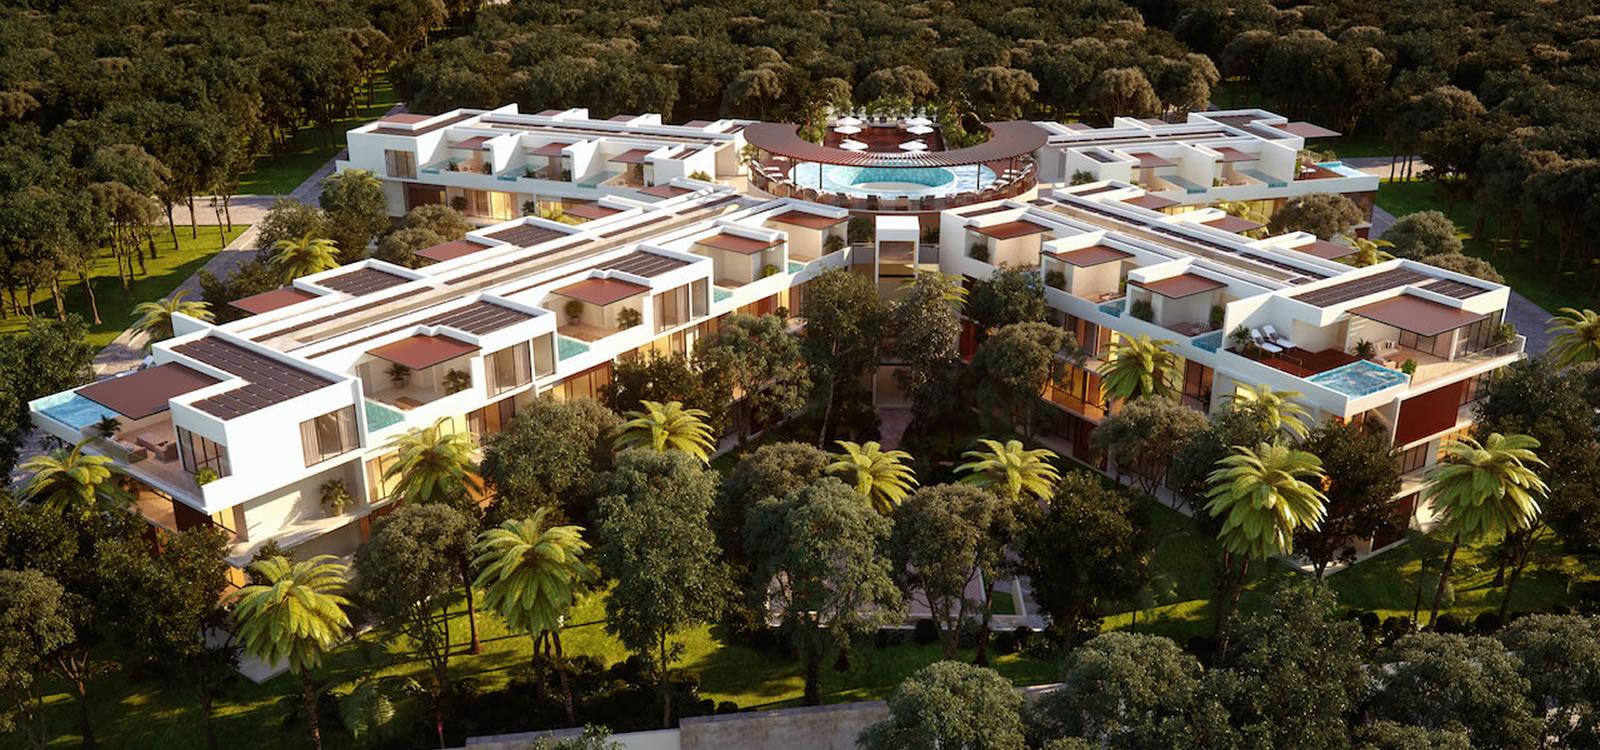 Penthouse Studio Condos for Sale, La Veleta, Tulum, Mexico - 7th ...